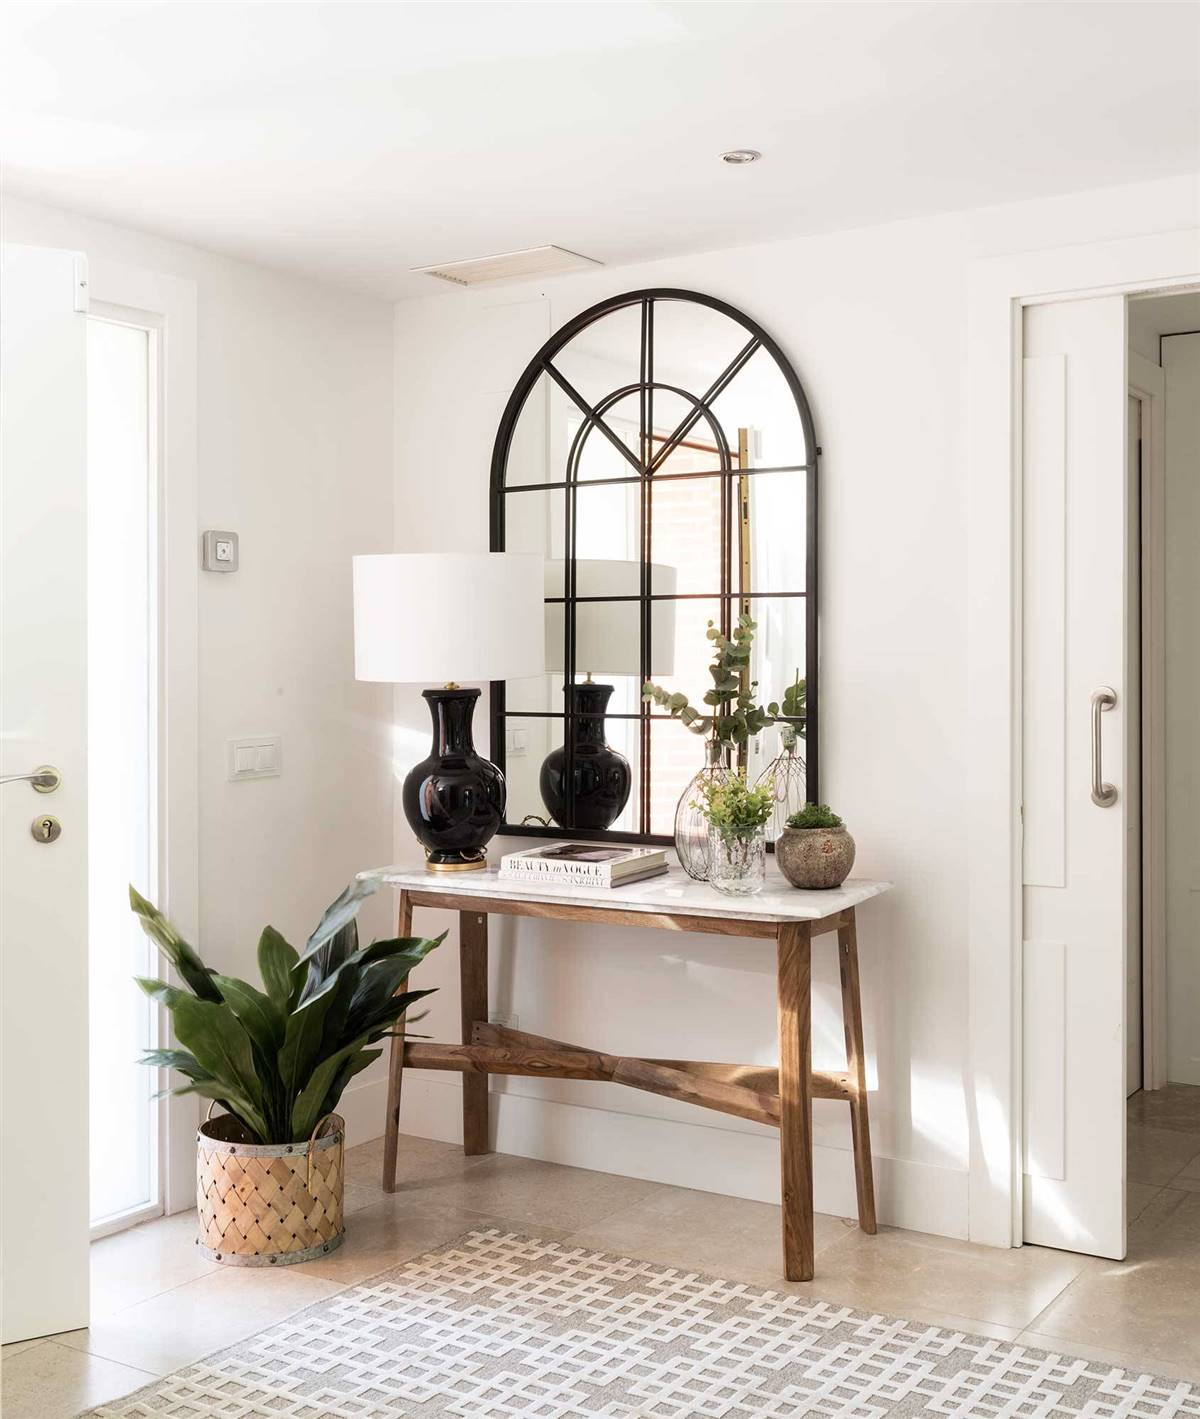 Hallway Decor Ideas12